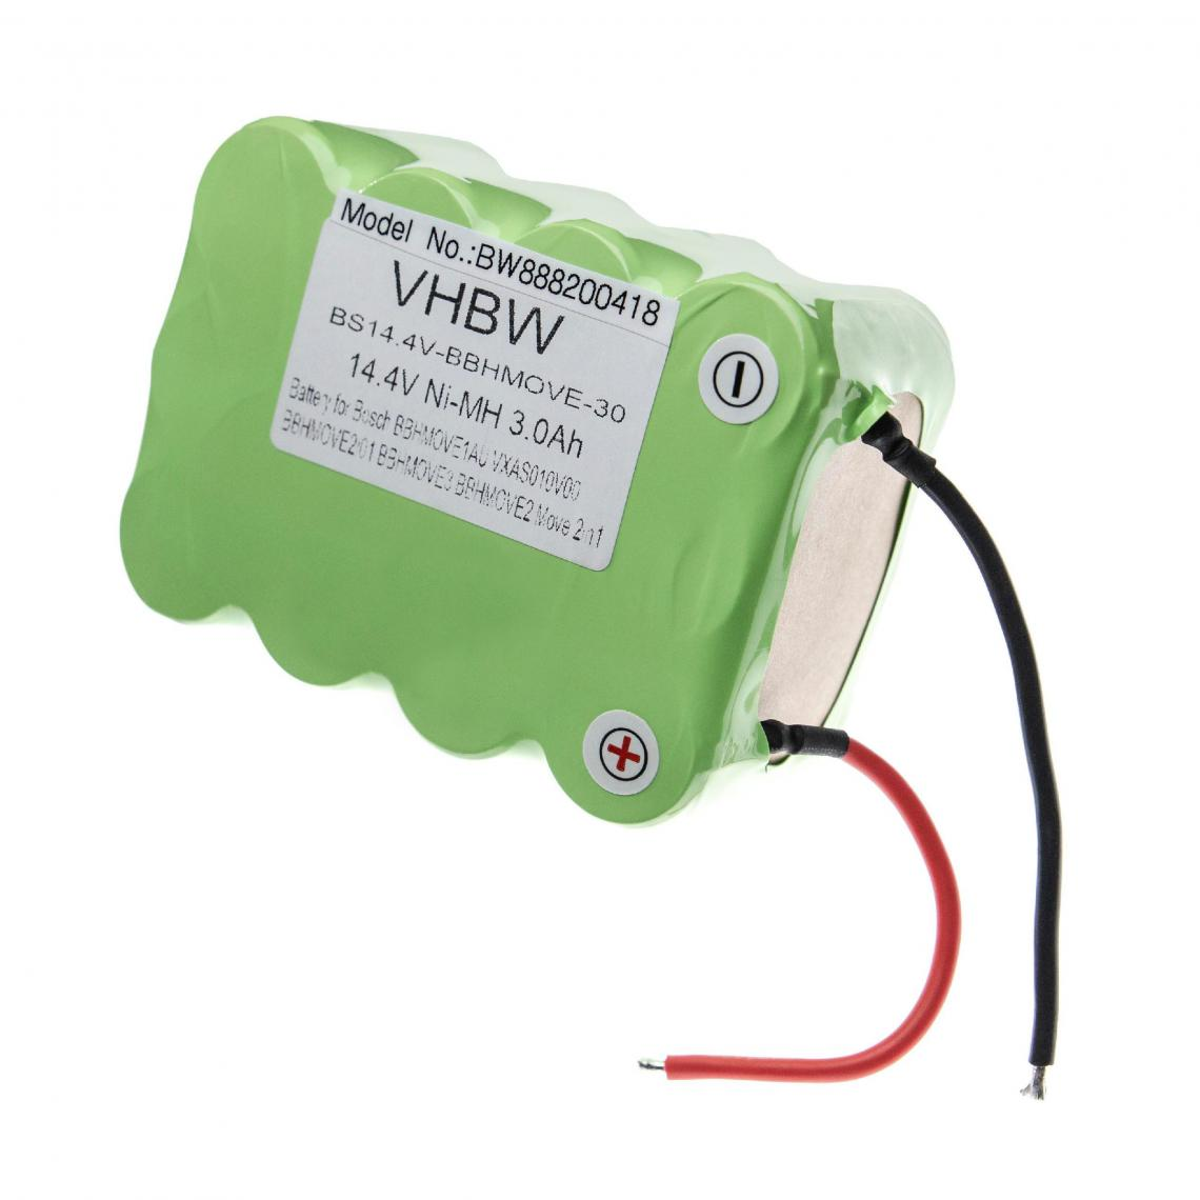 Vhbw vhbw batterie compatible avec Bosch Move BBHMOVE1N/01, BBHMOVE2/01, BBHMOVE2/03, BBHMOVE2/04 Home Cleaner (3000mAh, 14.4